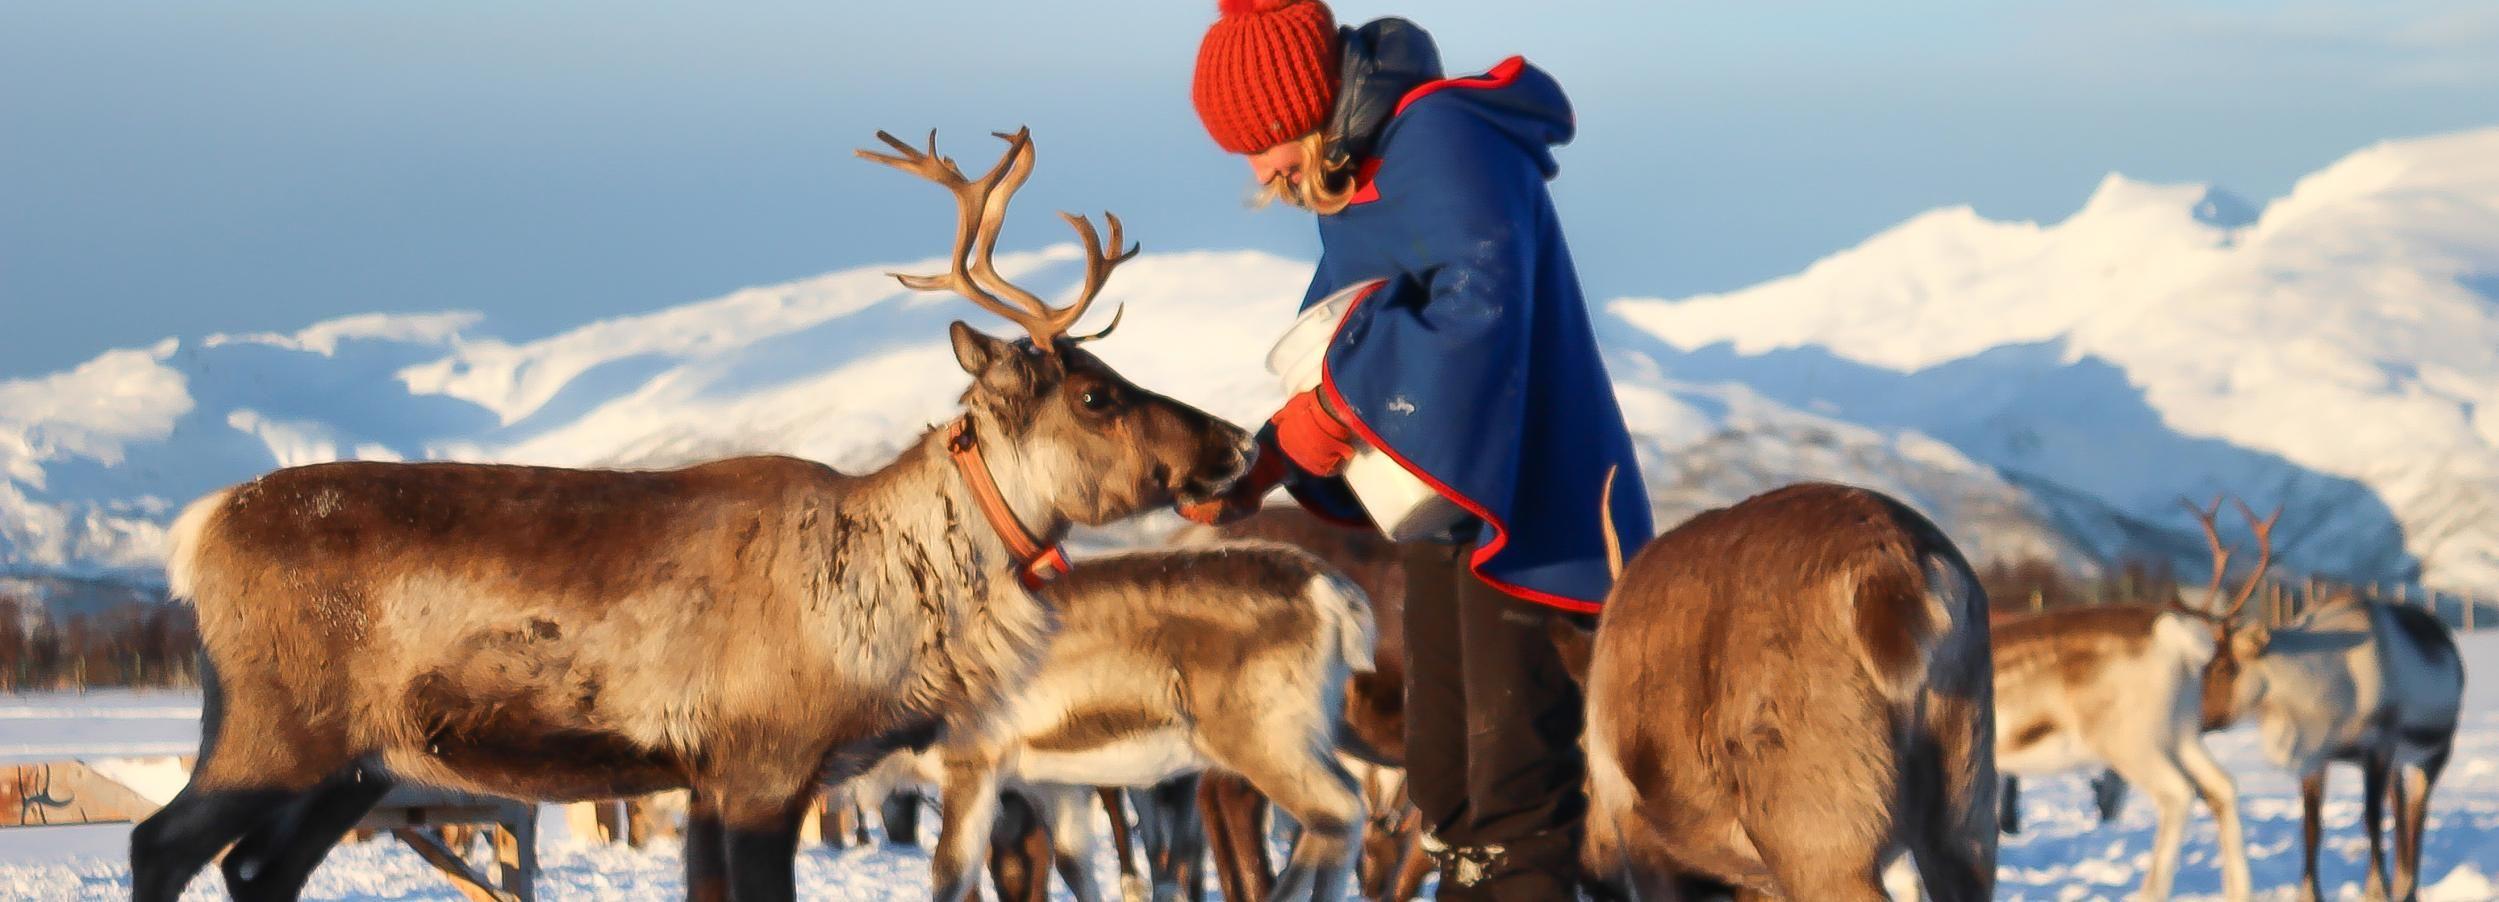 Vanuit Tromsø: rendierboerderij en de cultuur van de Sami